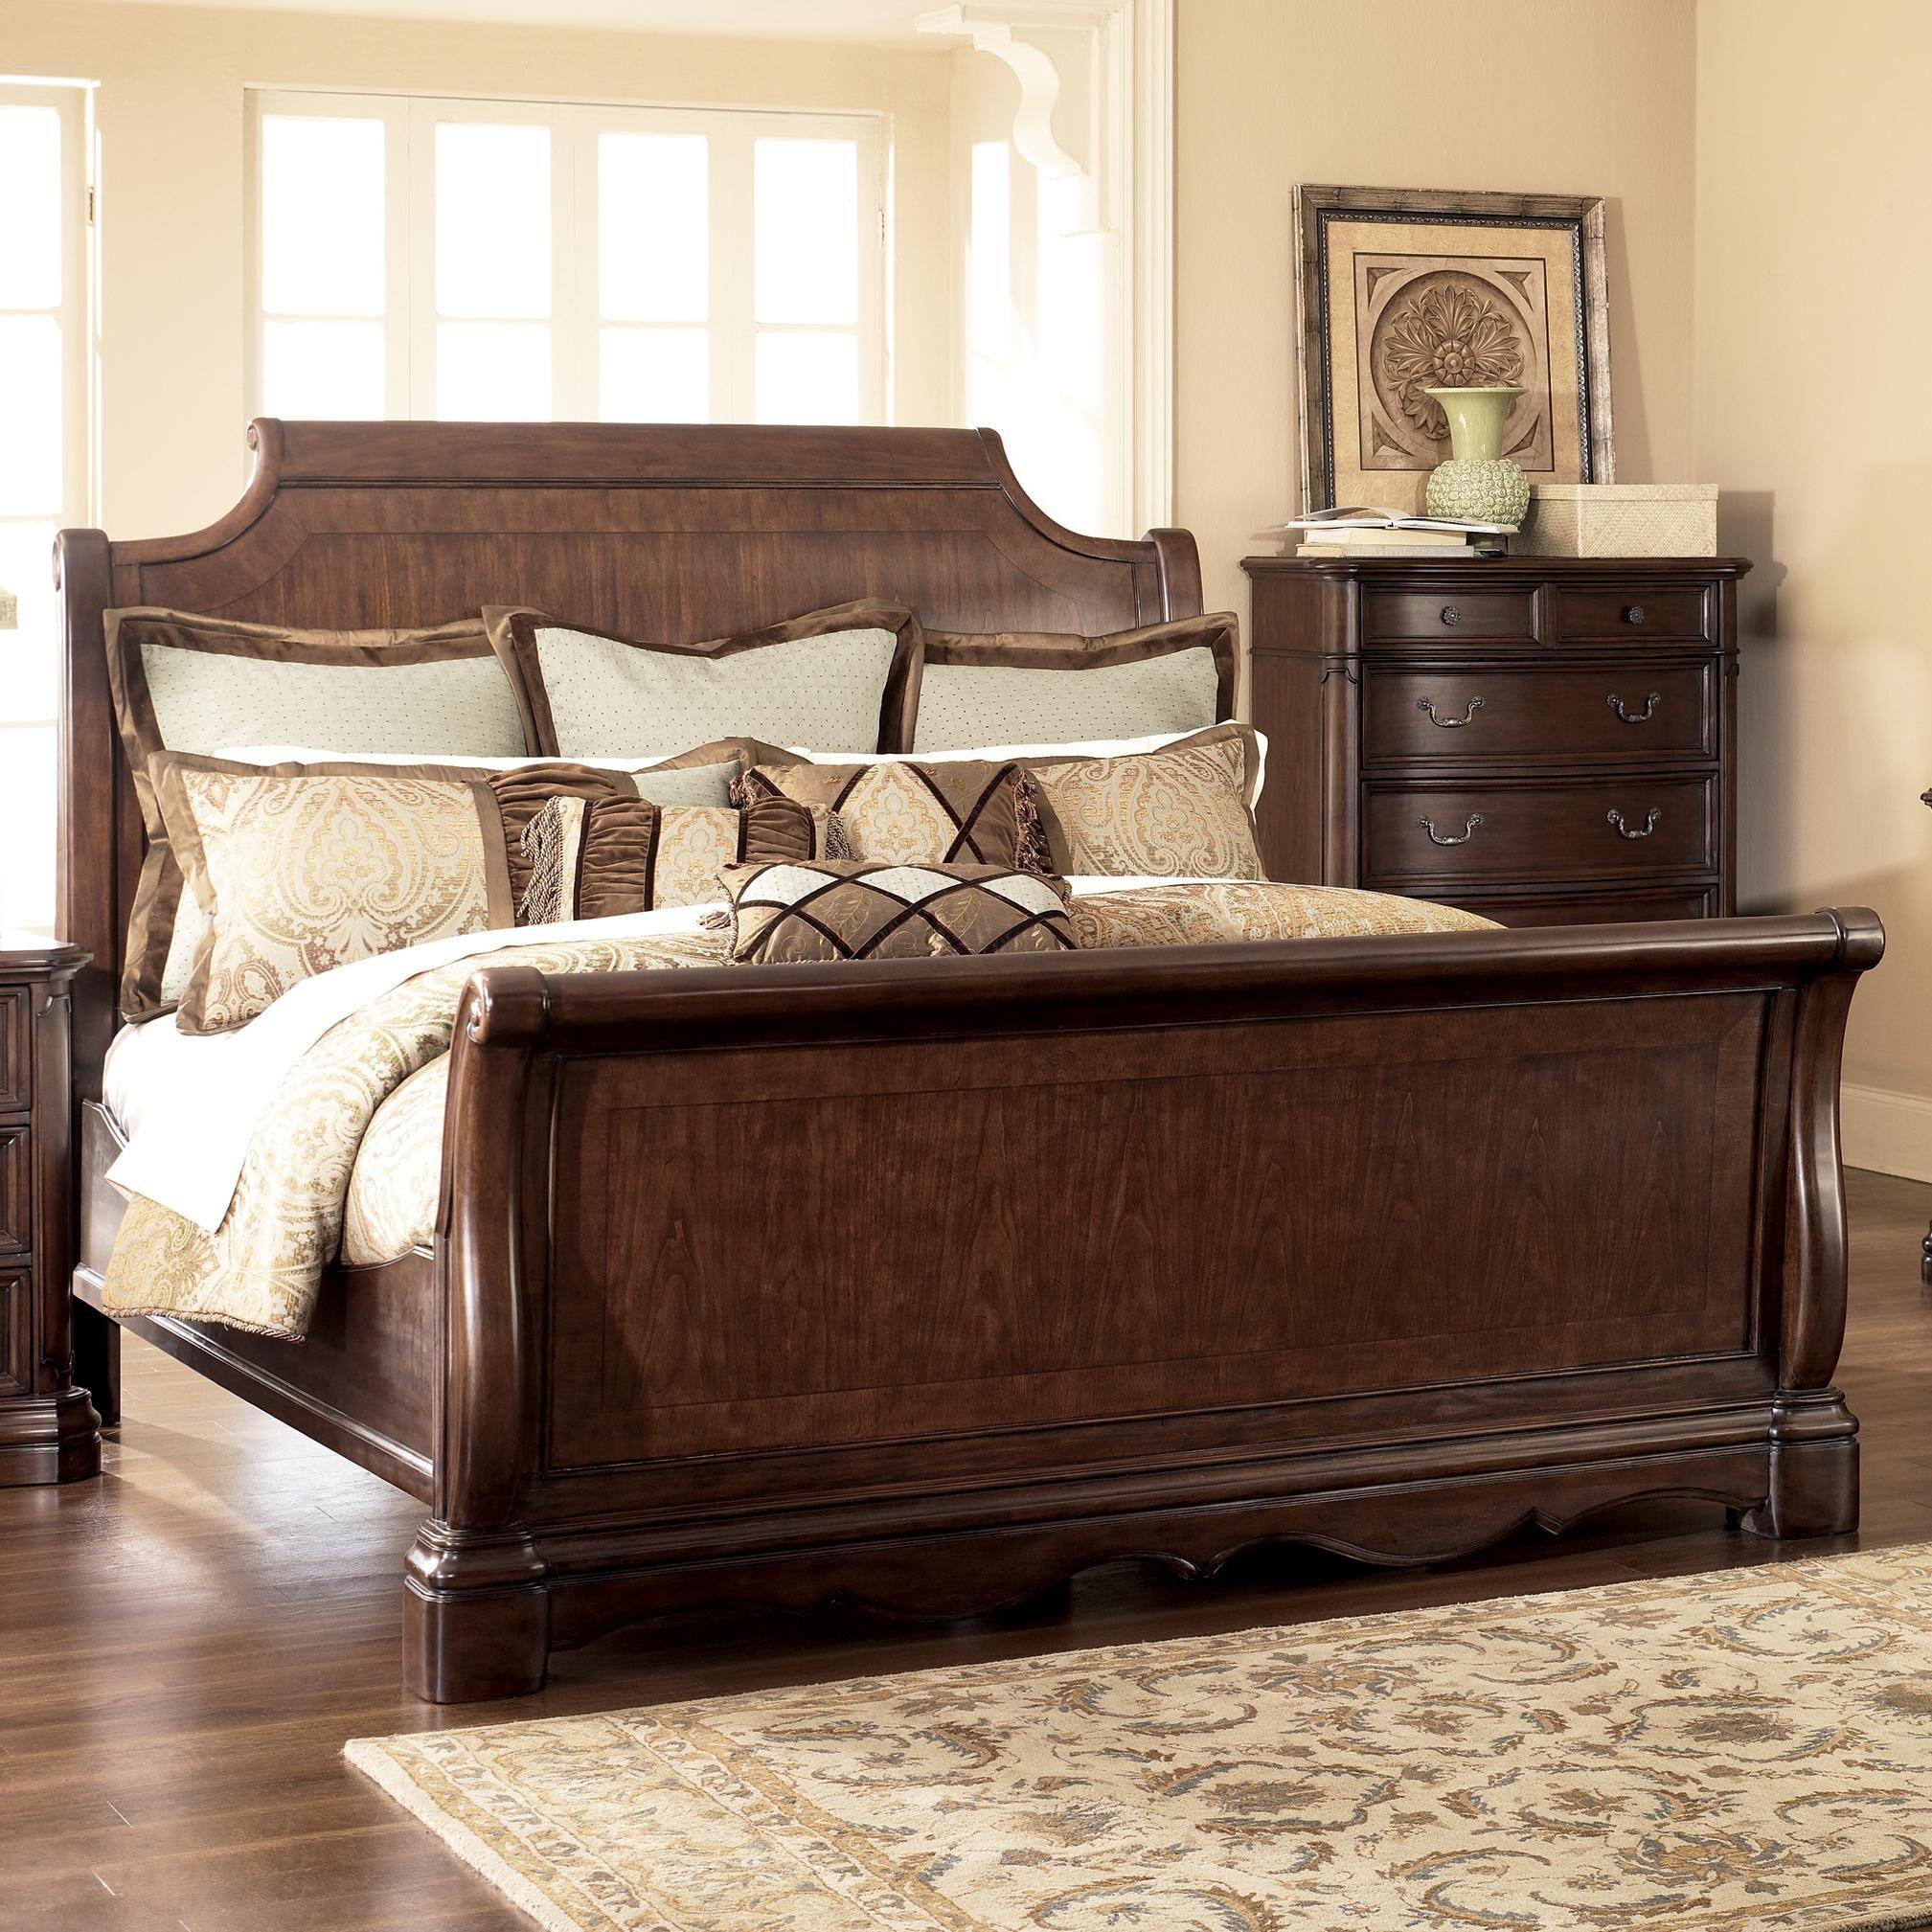 Camilla King Sleigh Bed By Ashley Millennium Pilgrim Furniture City Sleigh Bed Hartford Bridgeport Sleigh Bedroom Set Bedroom Sets Luxury Bedroom Master